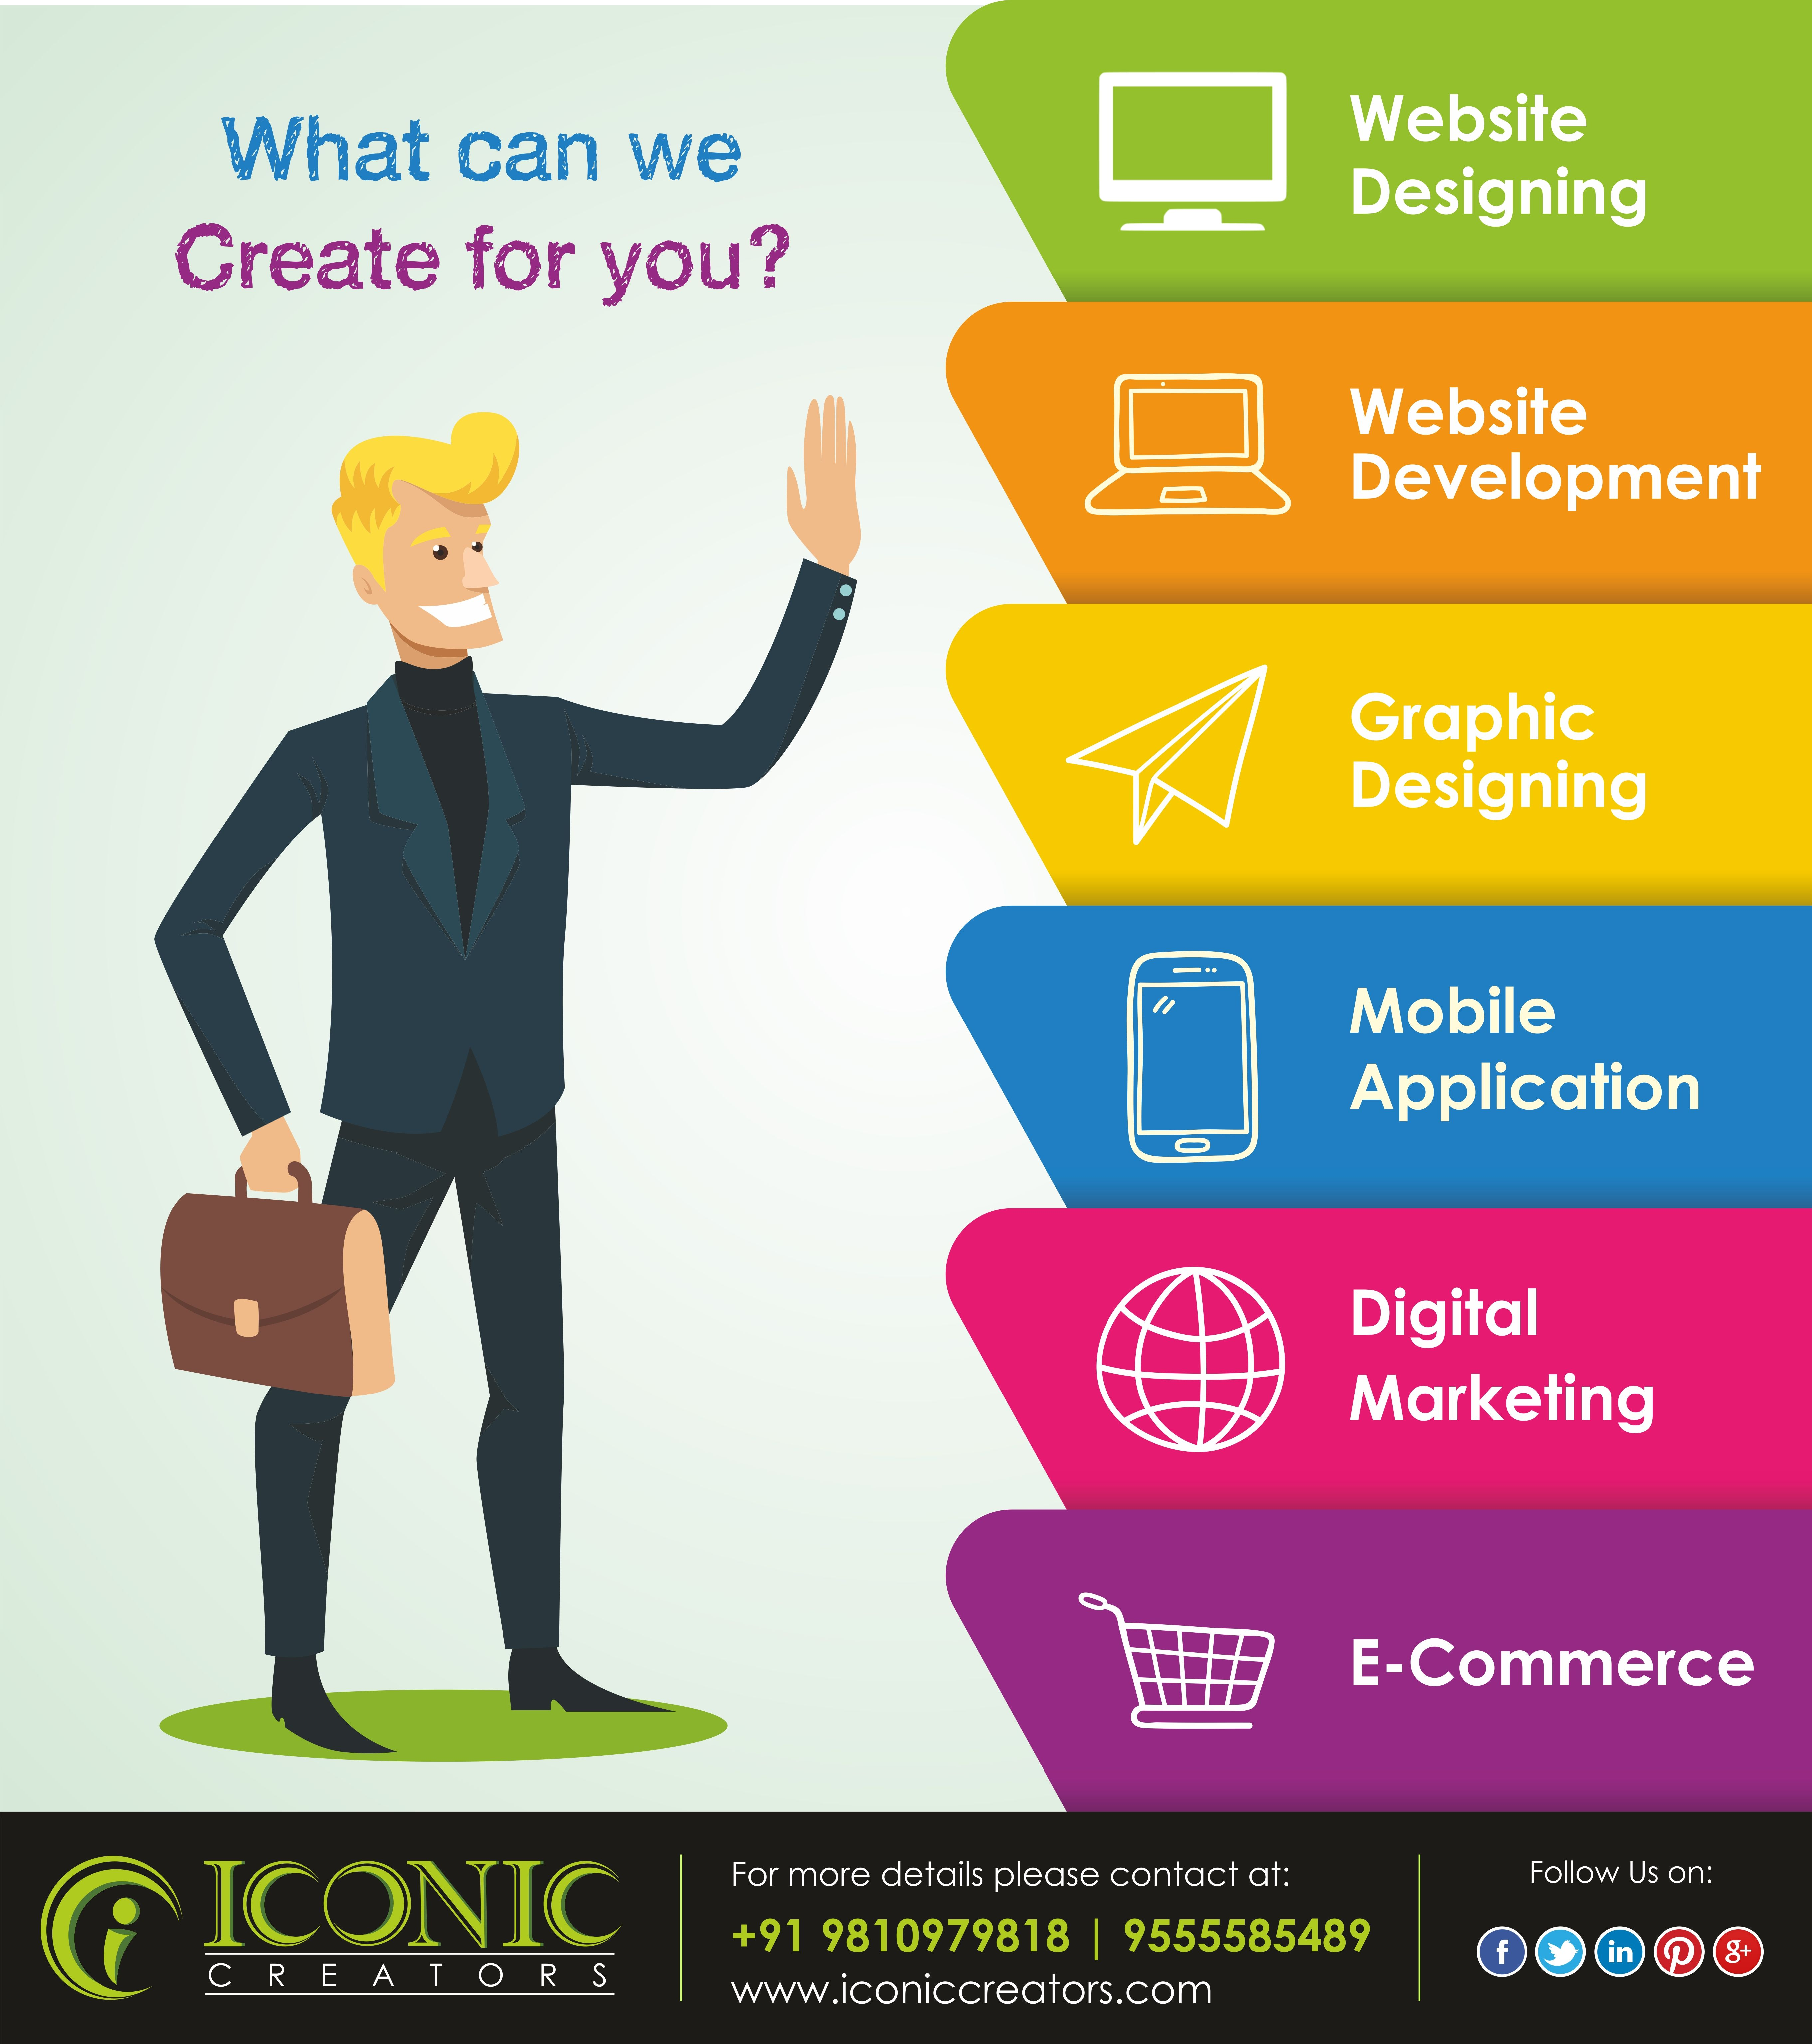 Iconic Creators is topmost website designing company in